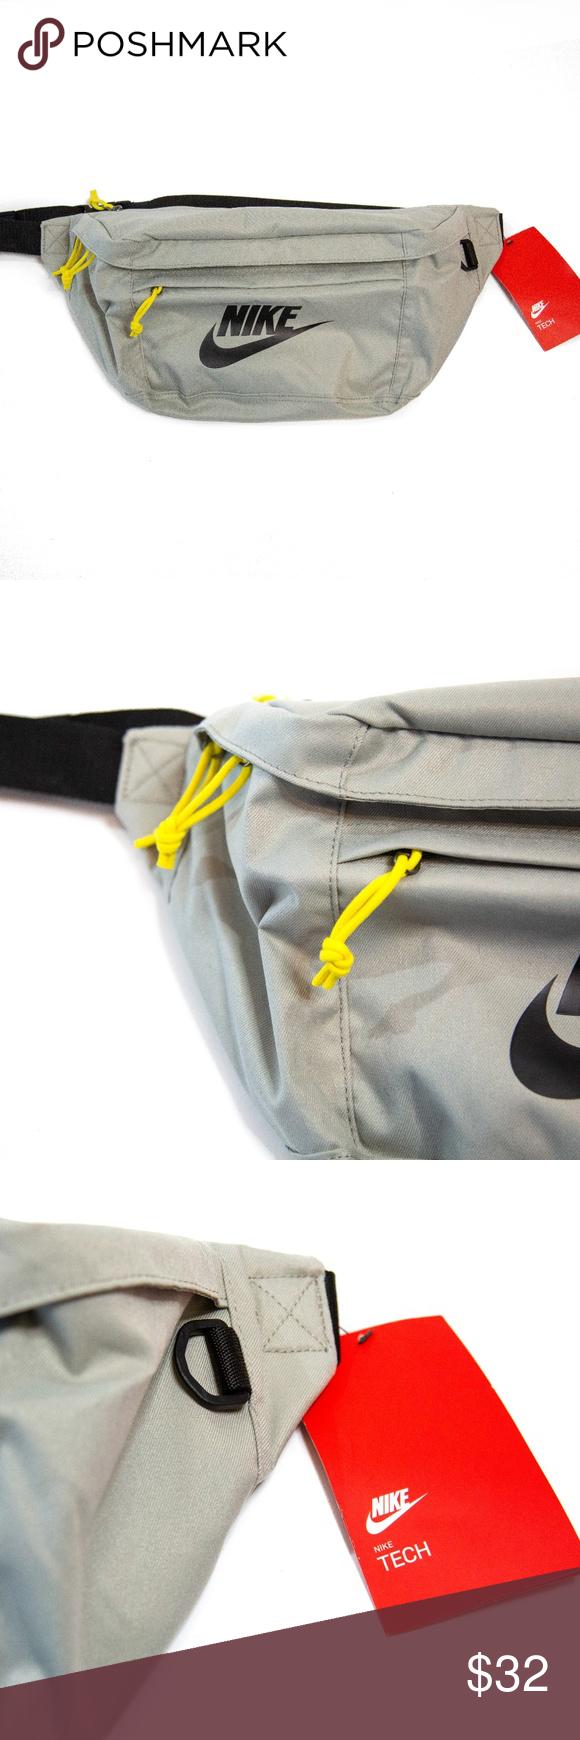 Nike Tech Hip Pack Nike tech, Clothes design, Nike bags